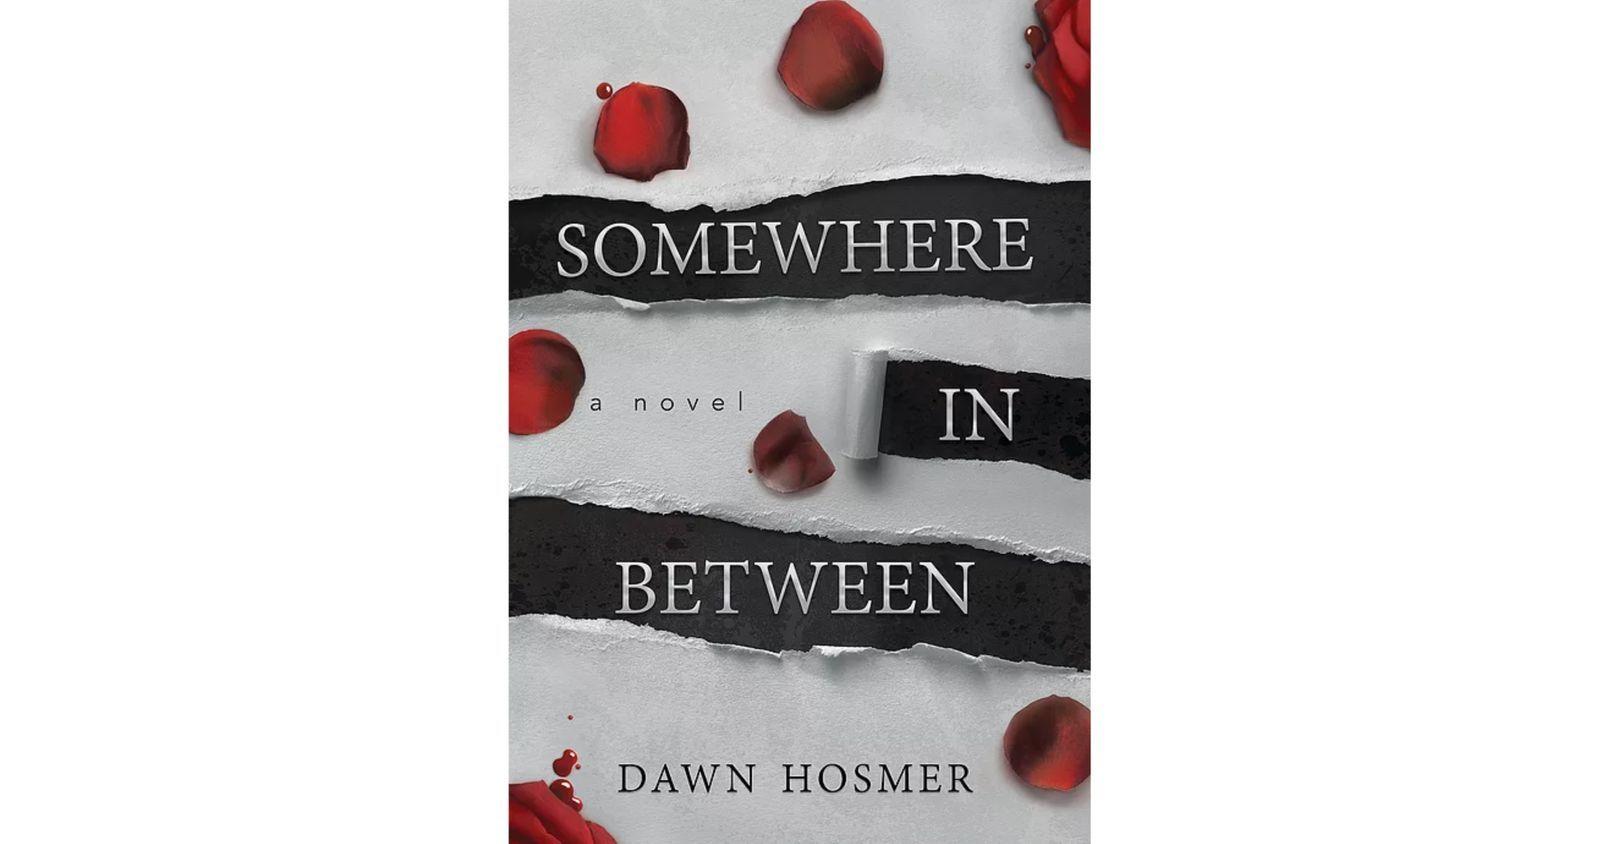 Somewhere in Between by Dawn Hosmer